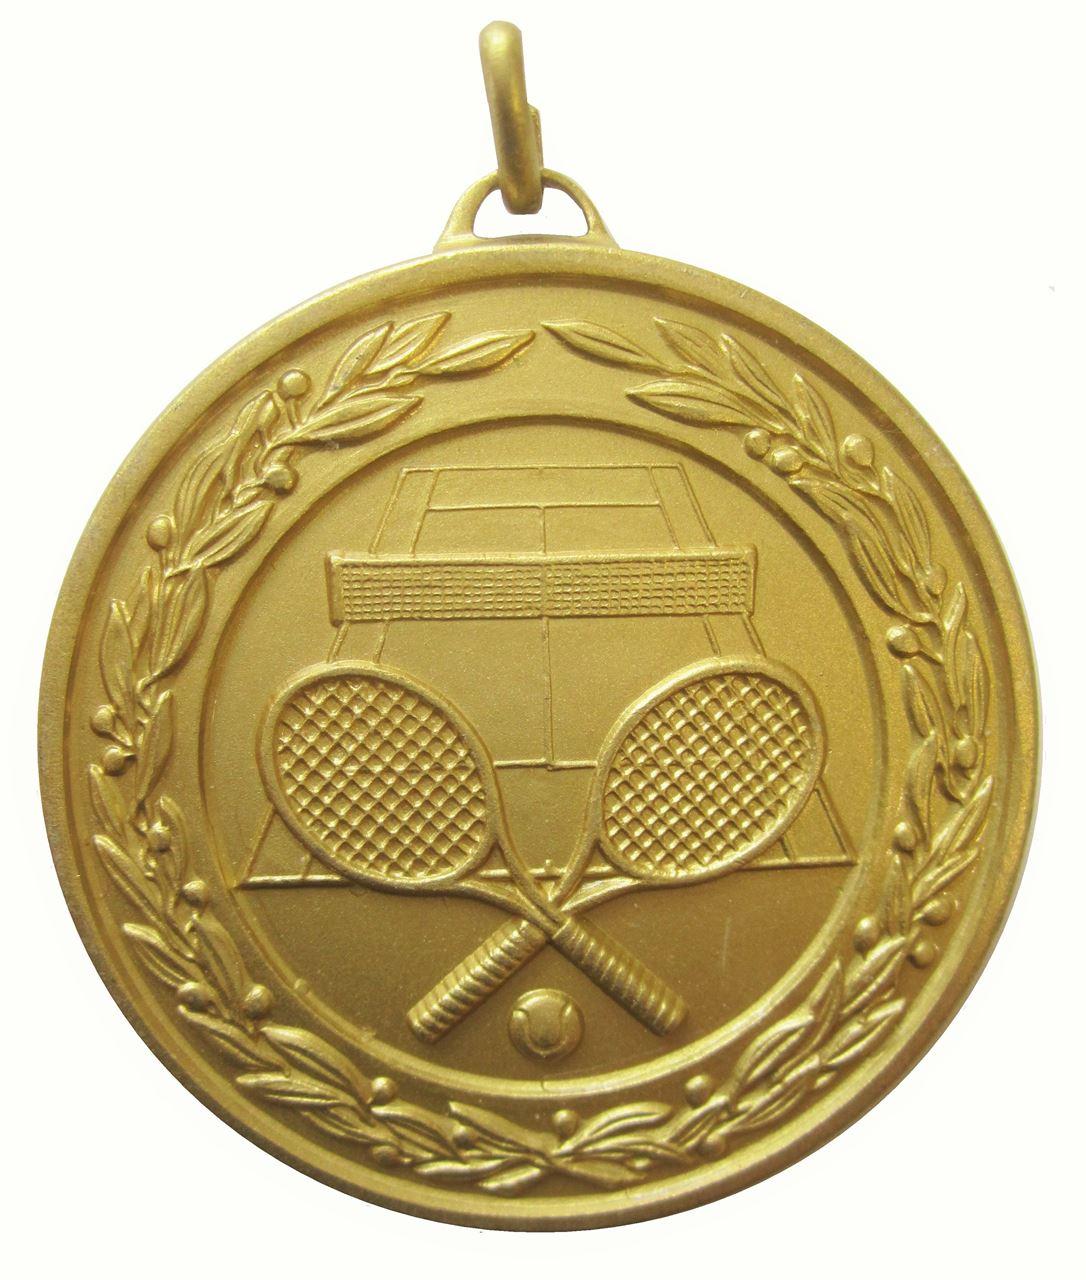 Gold Laurel Economy Tennis Medal (size: 50mm) - 9621E